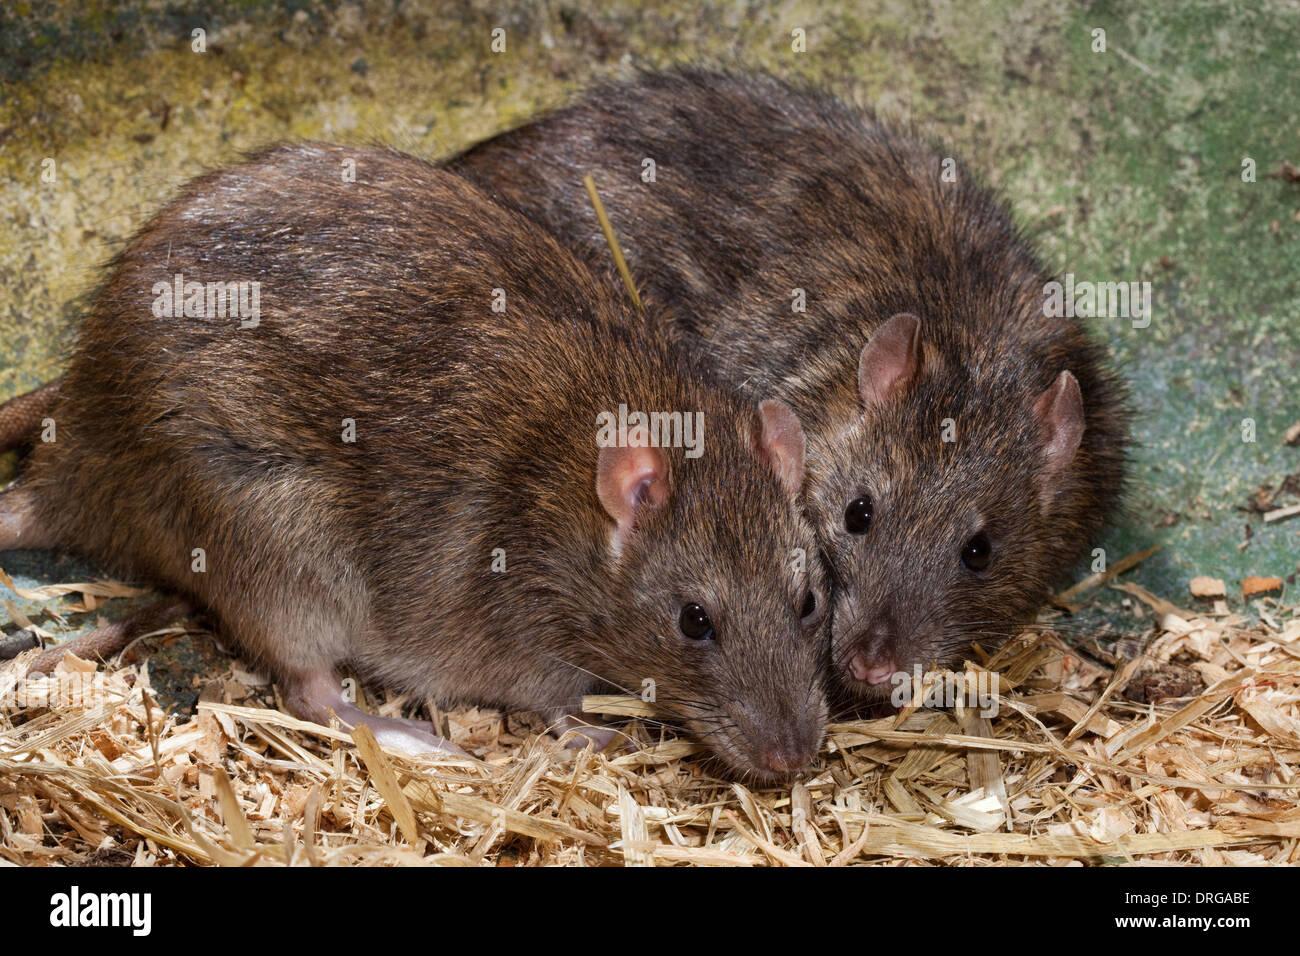 Braun oder Norwegen, Ratten (Rattus Norvegicus). Stockbild